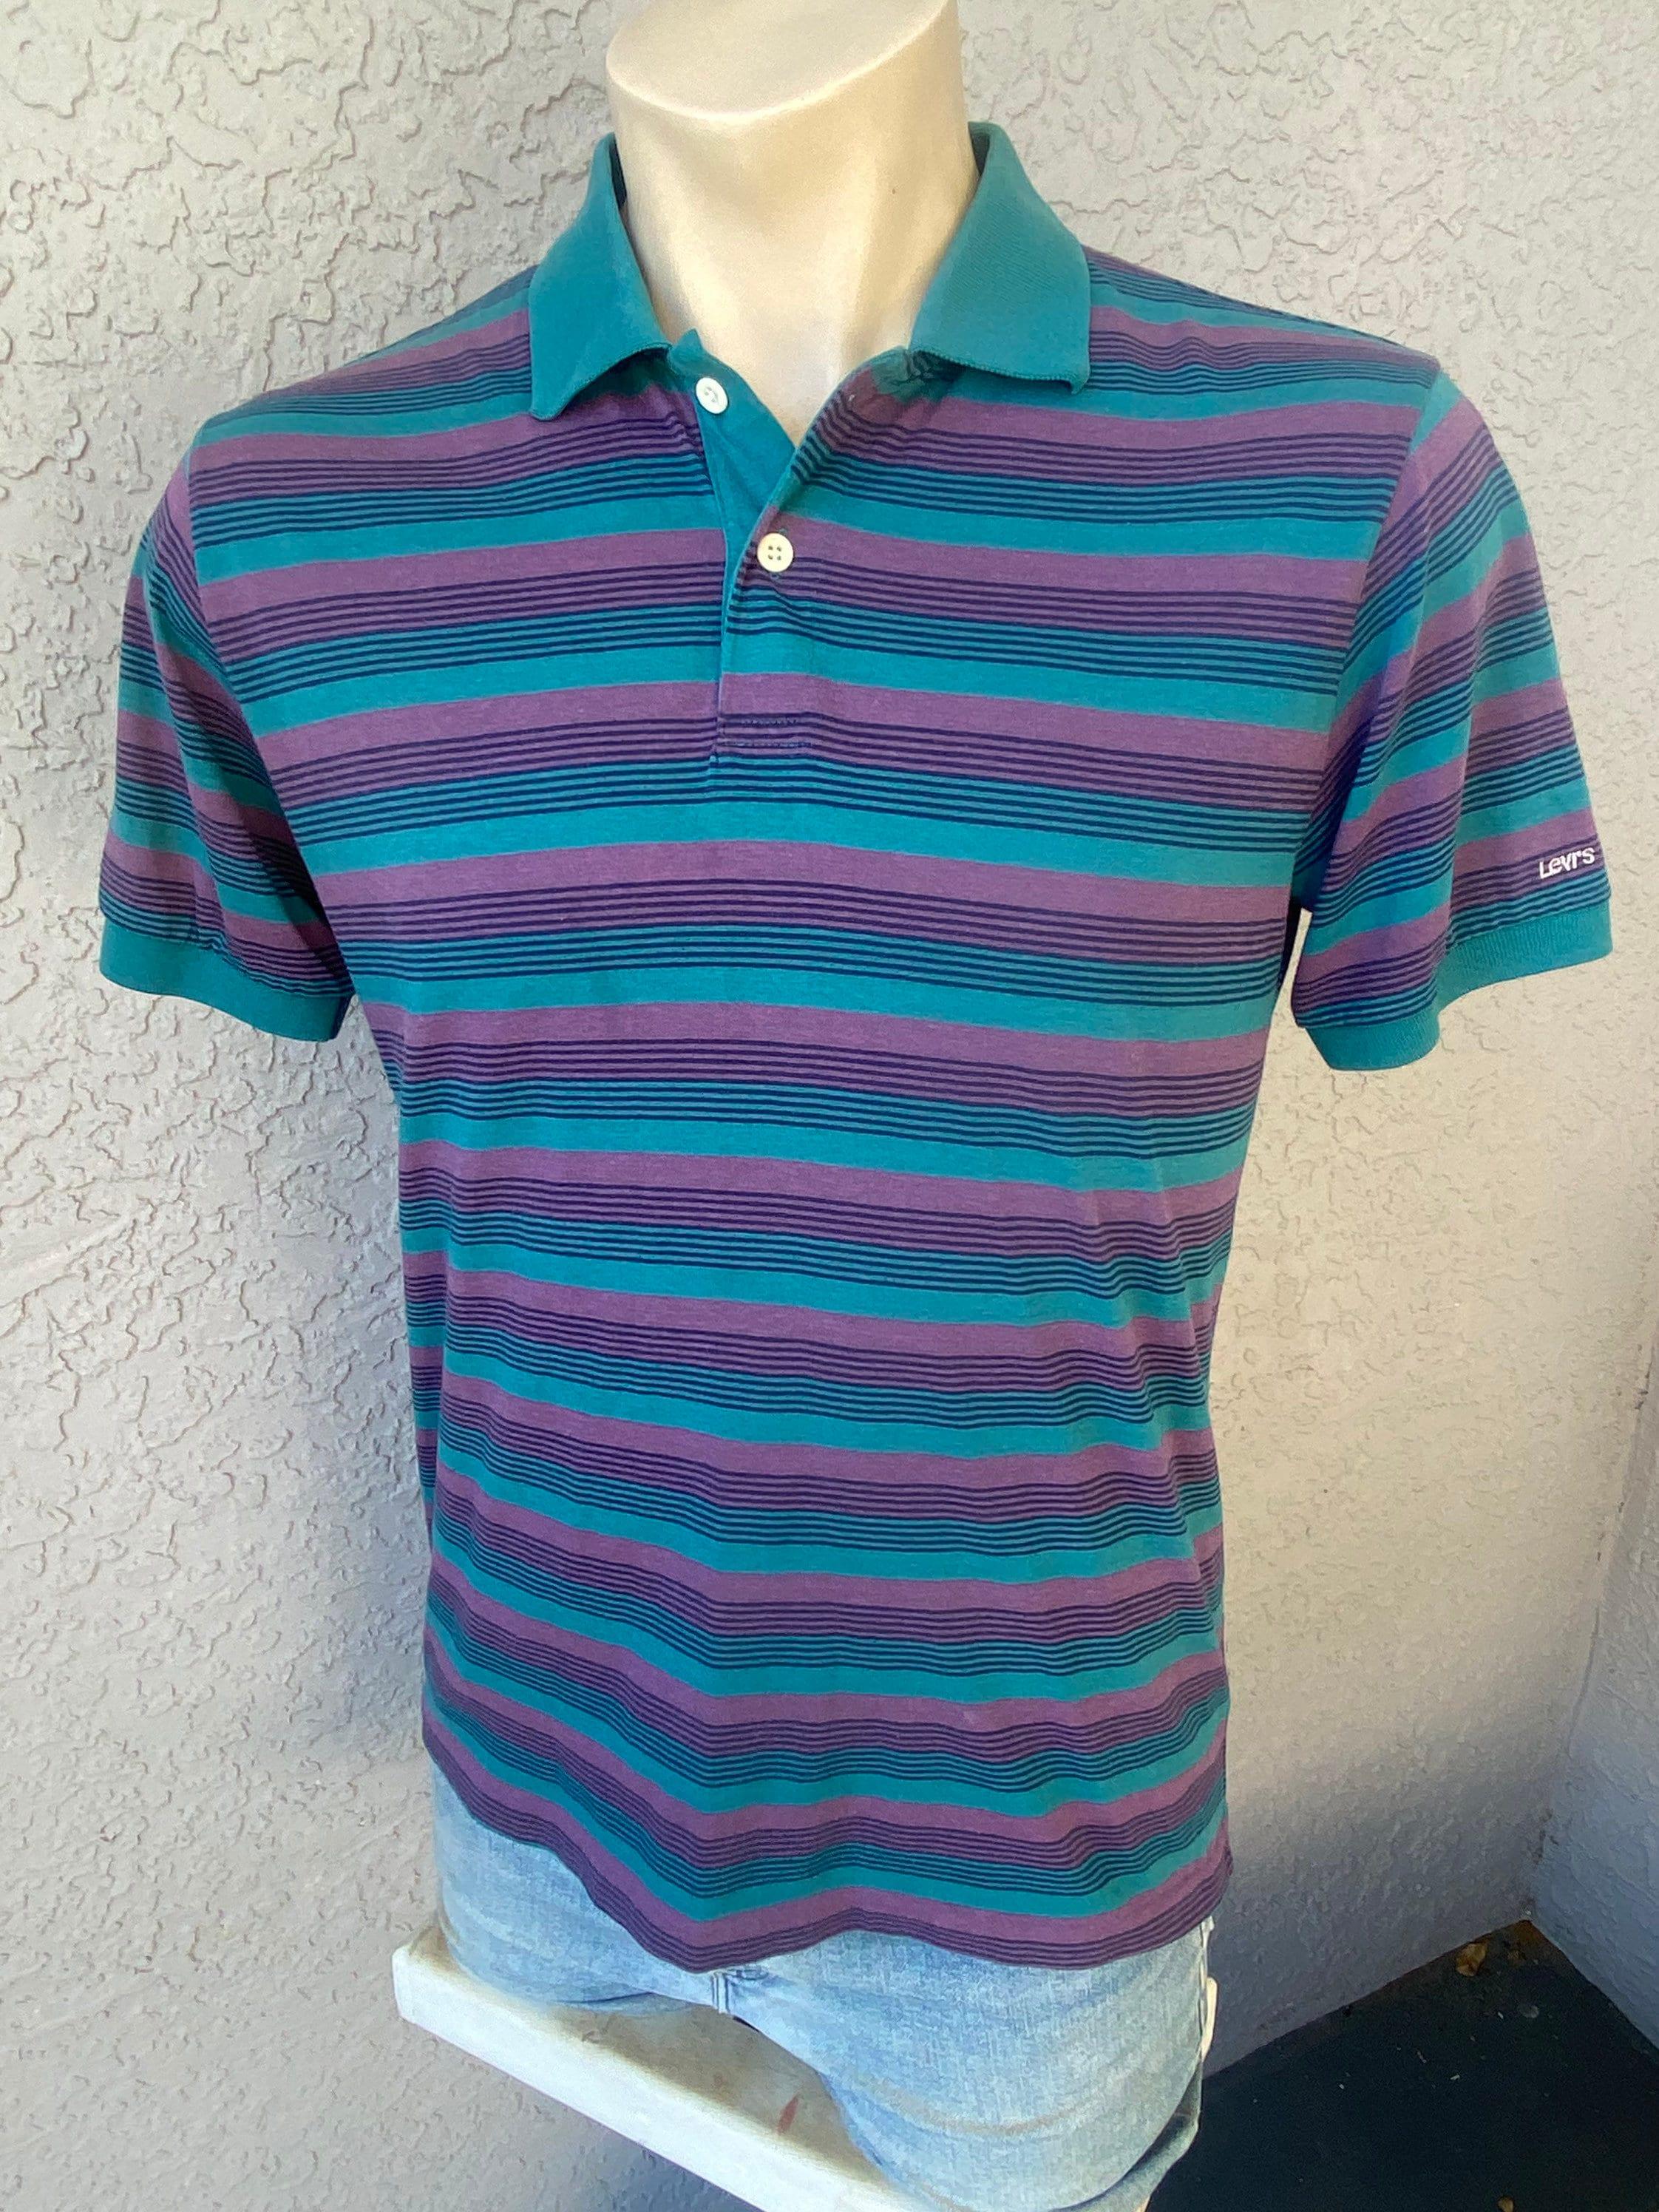 80s Tops, Shirts, T-shirts, Blouse   90s T-shirts Levis 1980S Striped Vintage Polo - Size Large $20.00 AT vintagedancer.com